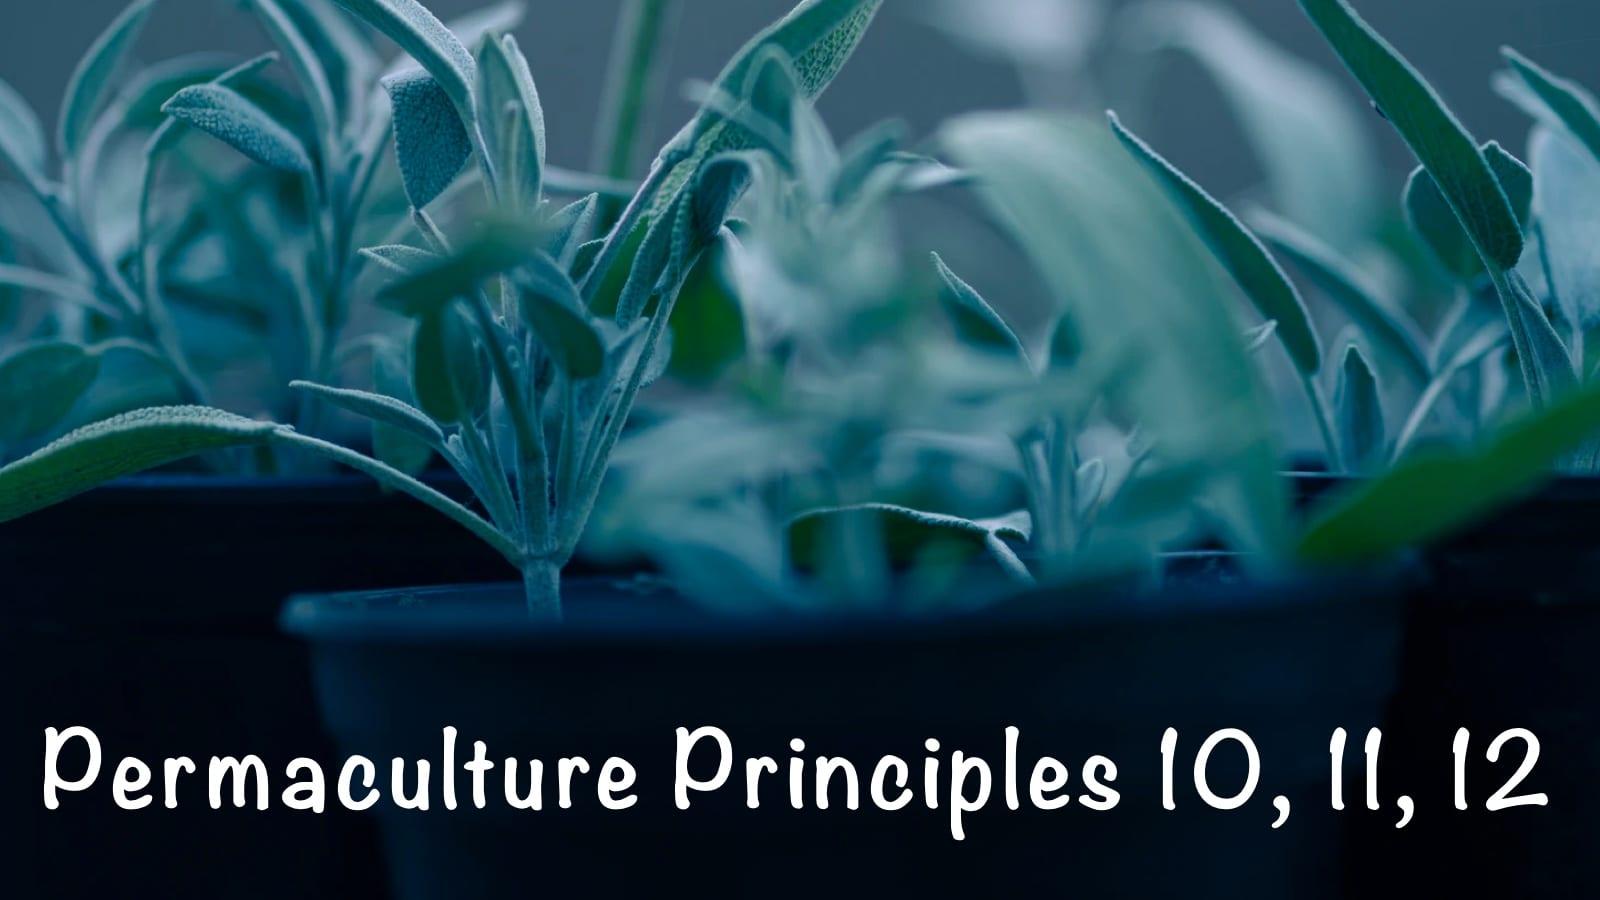 Permaculture Principles 10, 11, 12